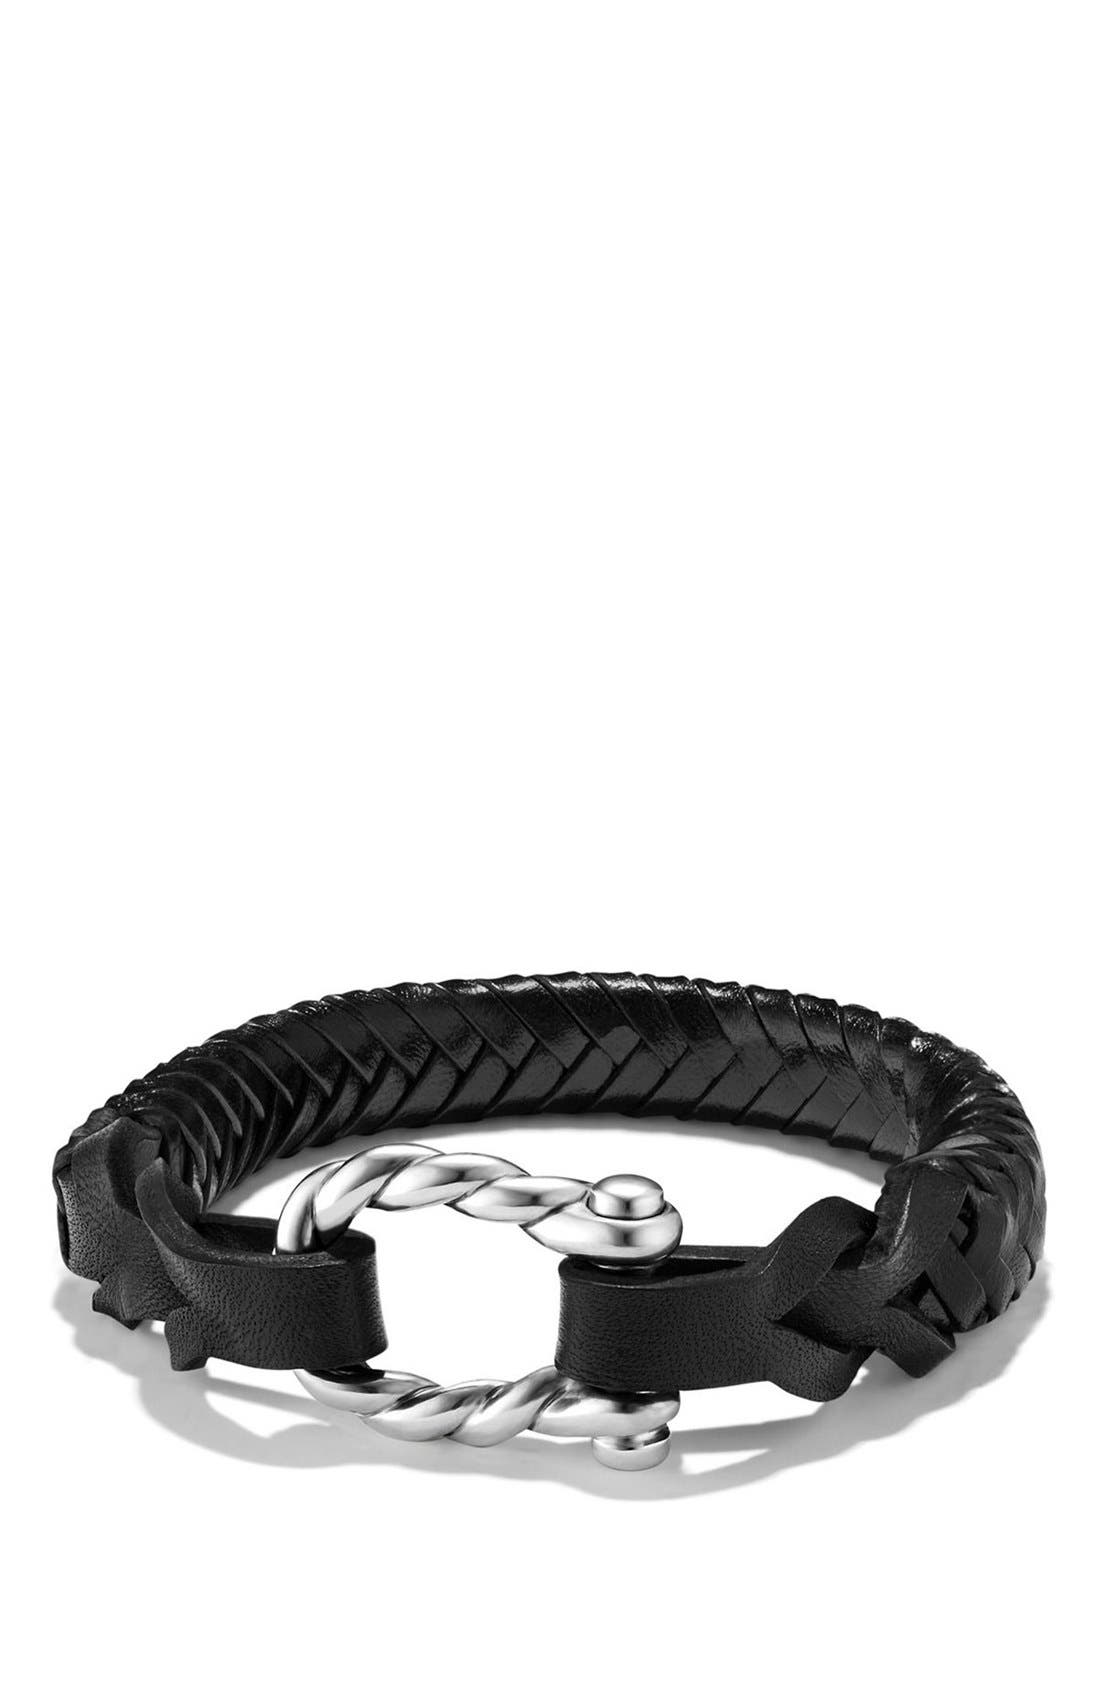 DAVID YURMAN, 'Maritime' Leather Woven Shackle Bracelet, Main thumbnail 1, color, SILVER/ BLACK